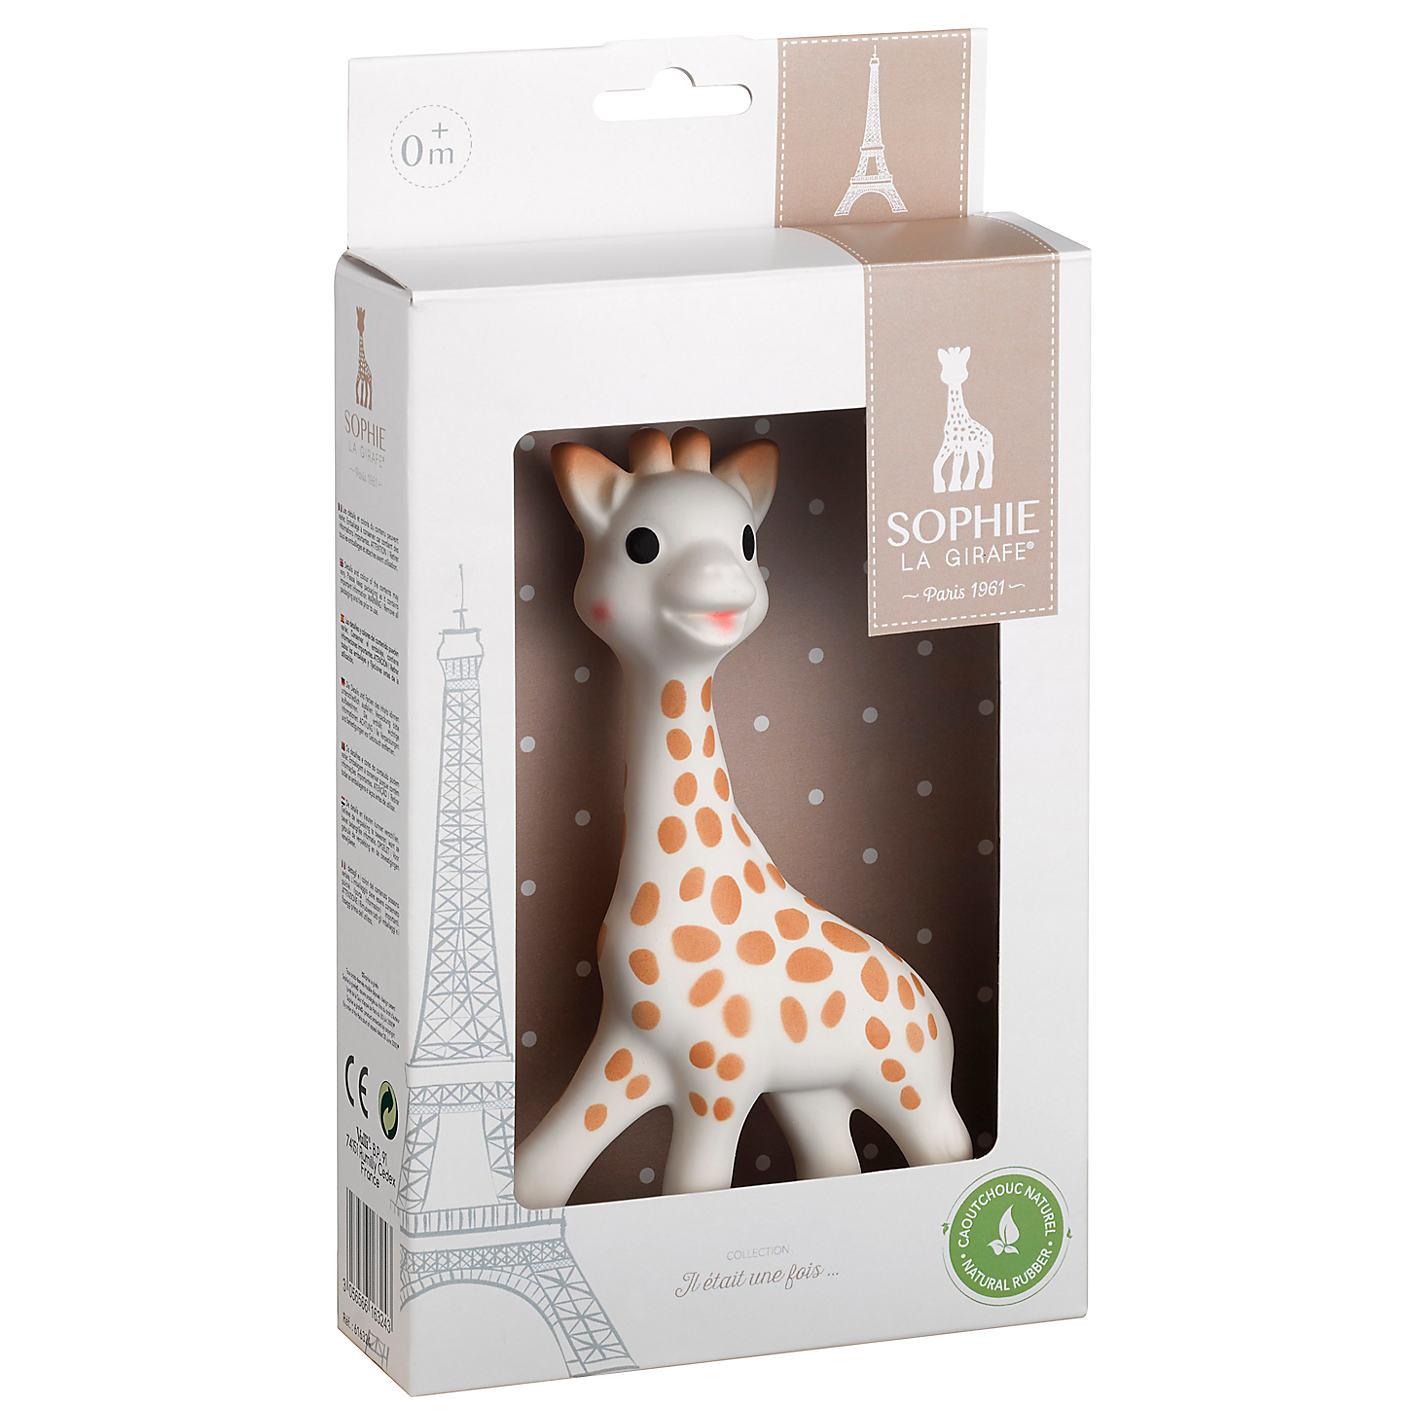 Sophie La Girafe ยางกัดยีราฟโซฟี